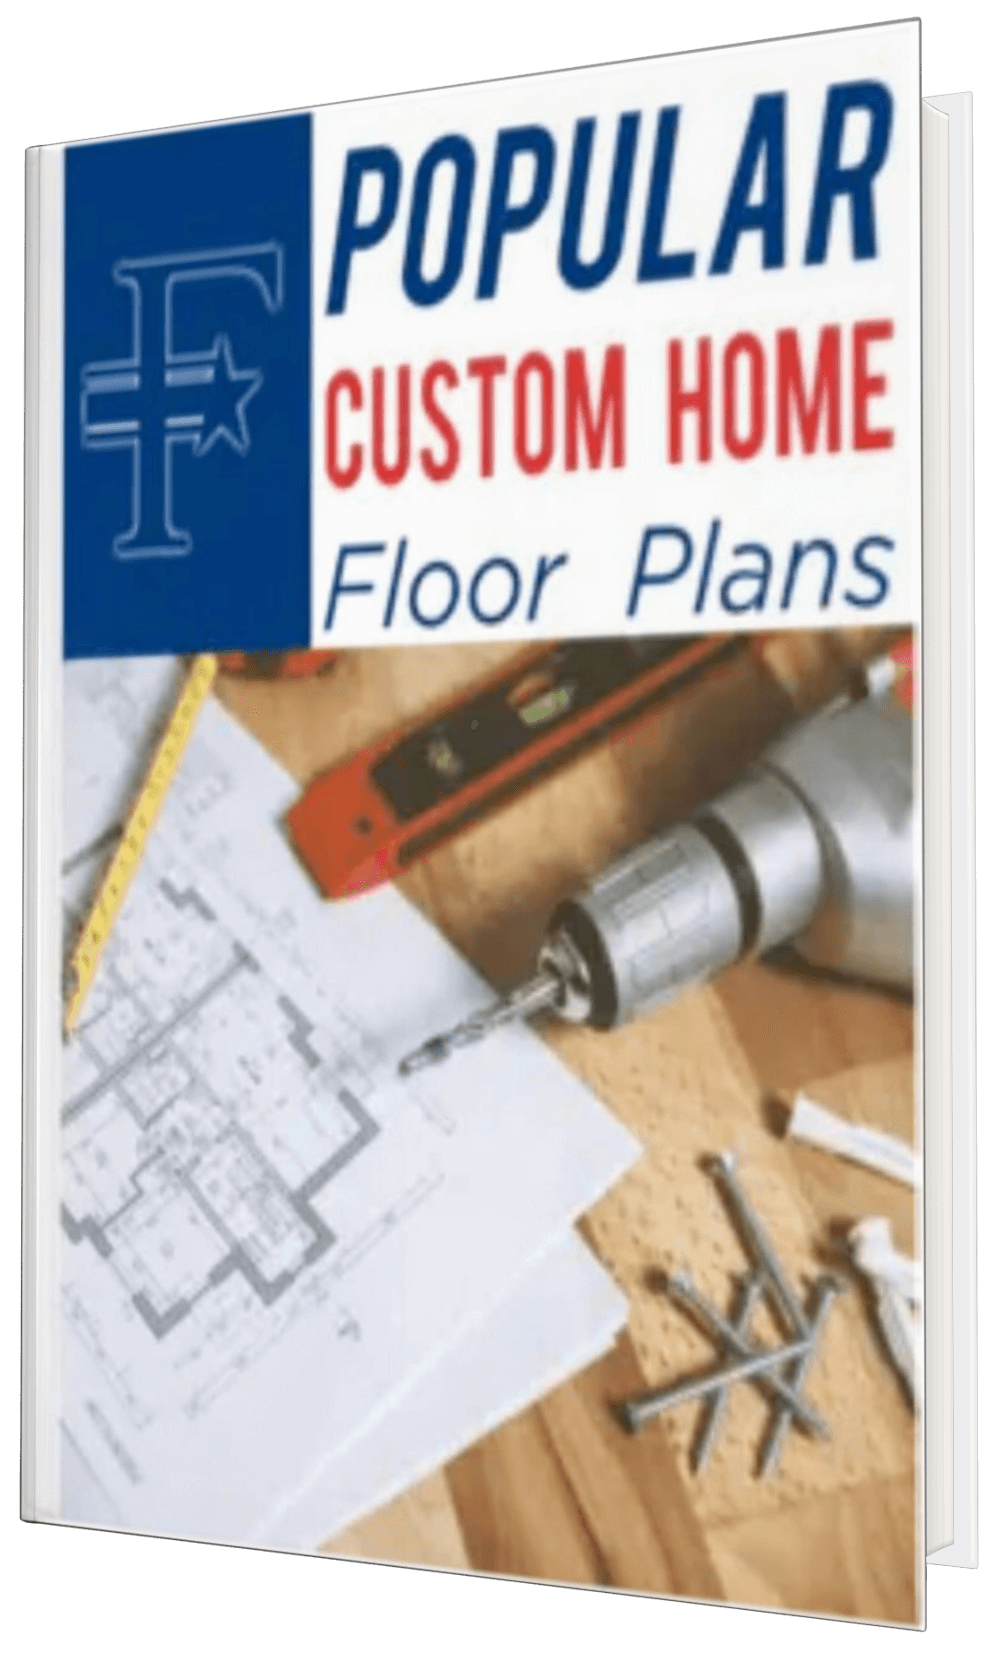 Popular Custom Home Floor Plans